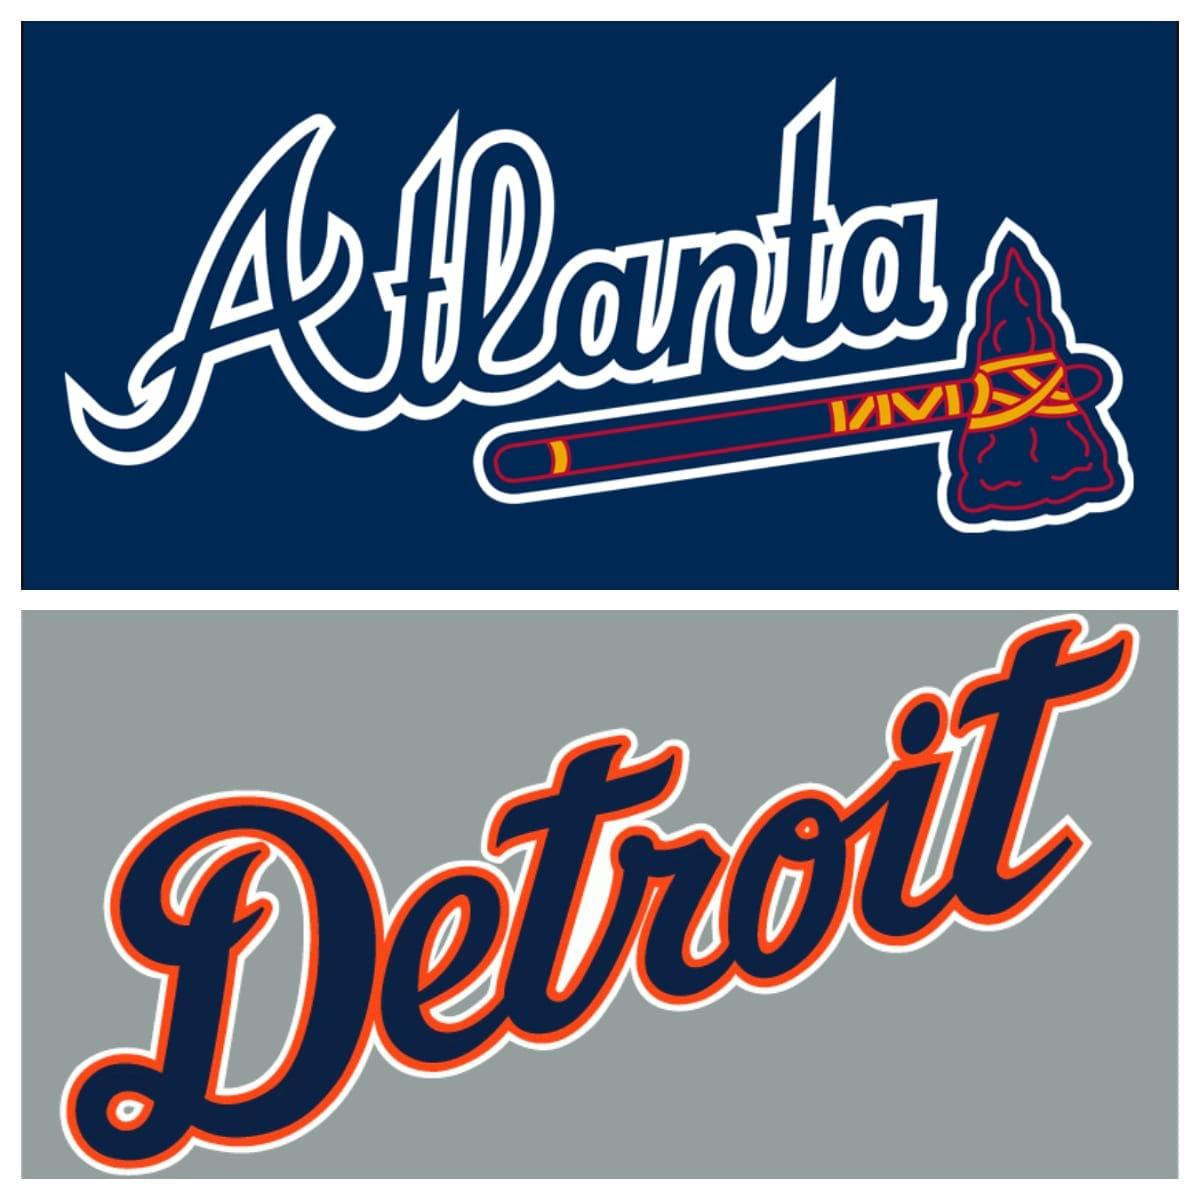 Atlanta Braves vs Detroit Tigers Stats